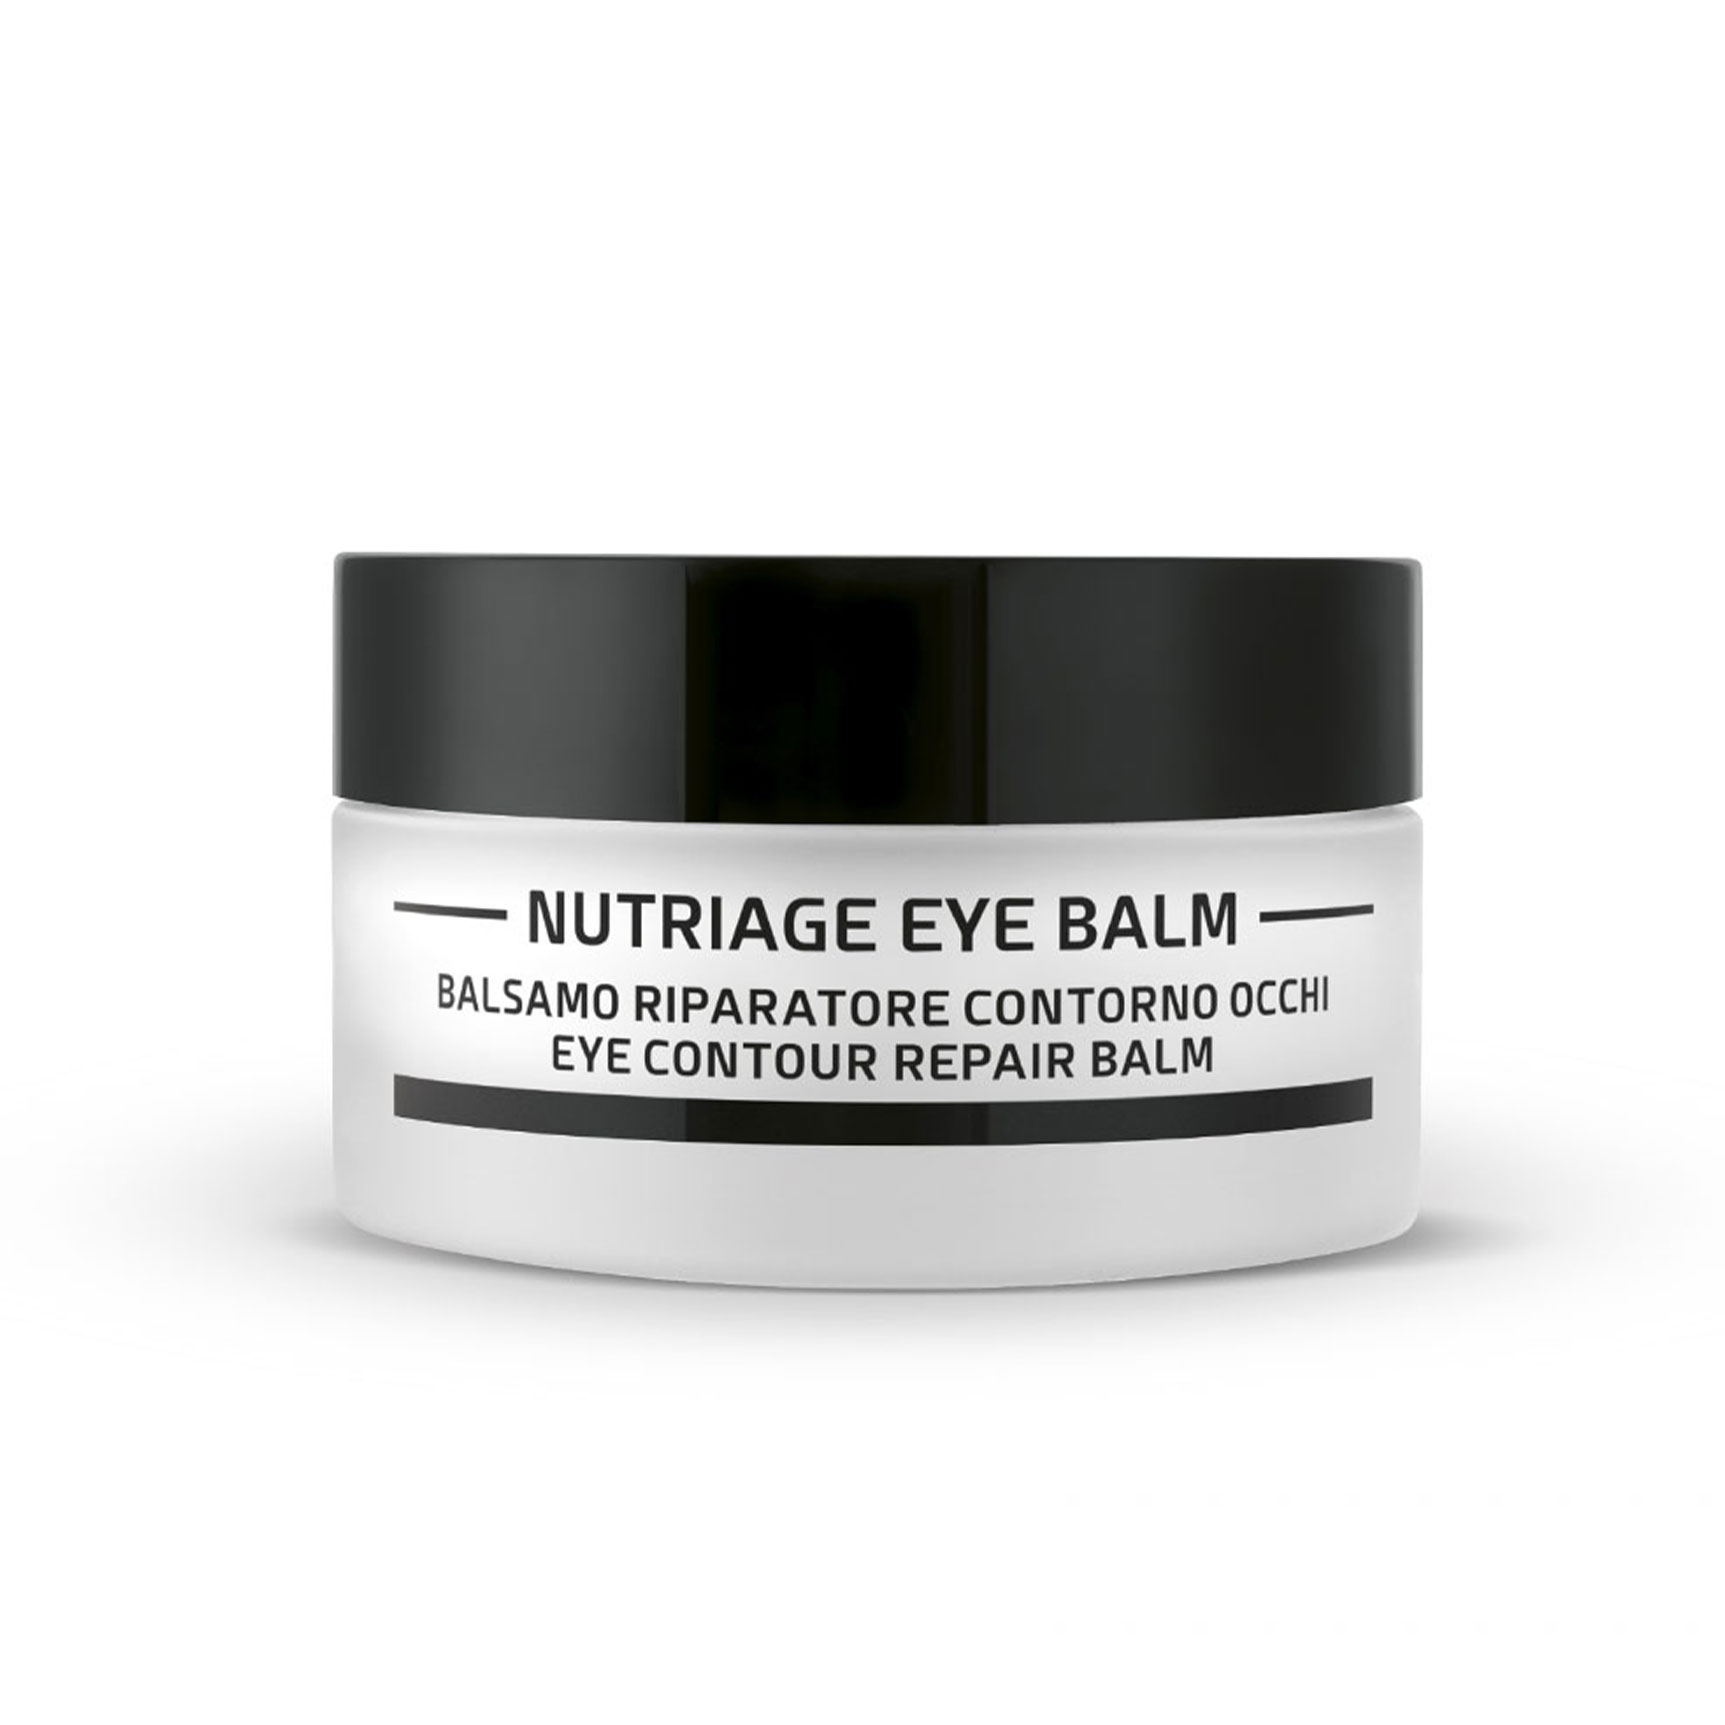 nutriage-eye-balm-cosmetici-magistrali